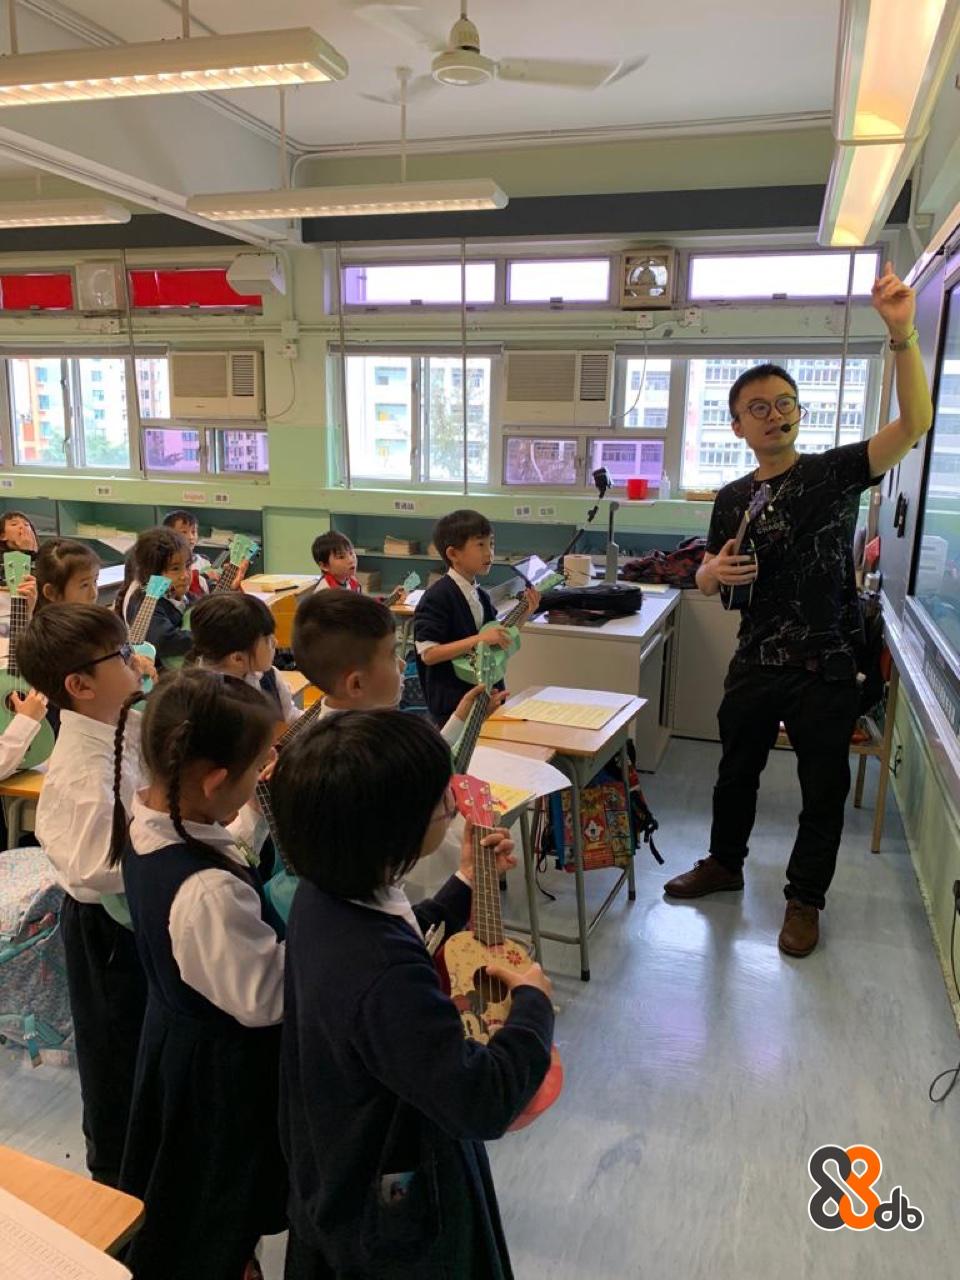 Classroom,Room,Event,Organism,School